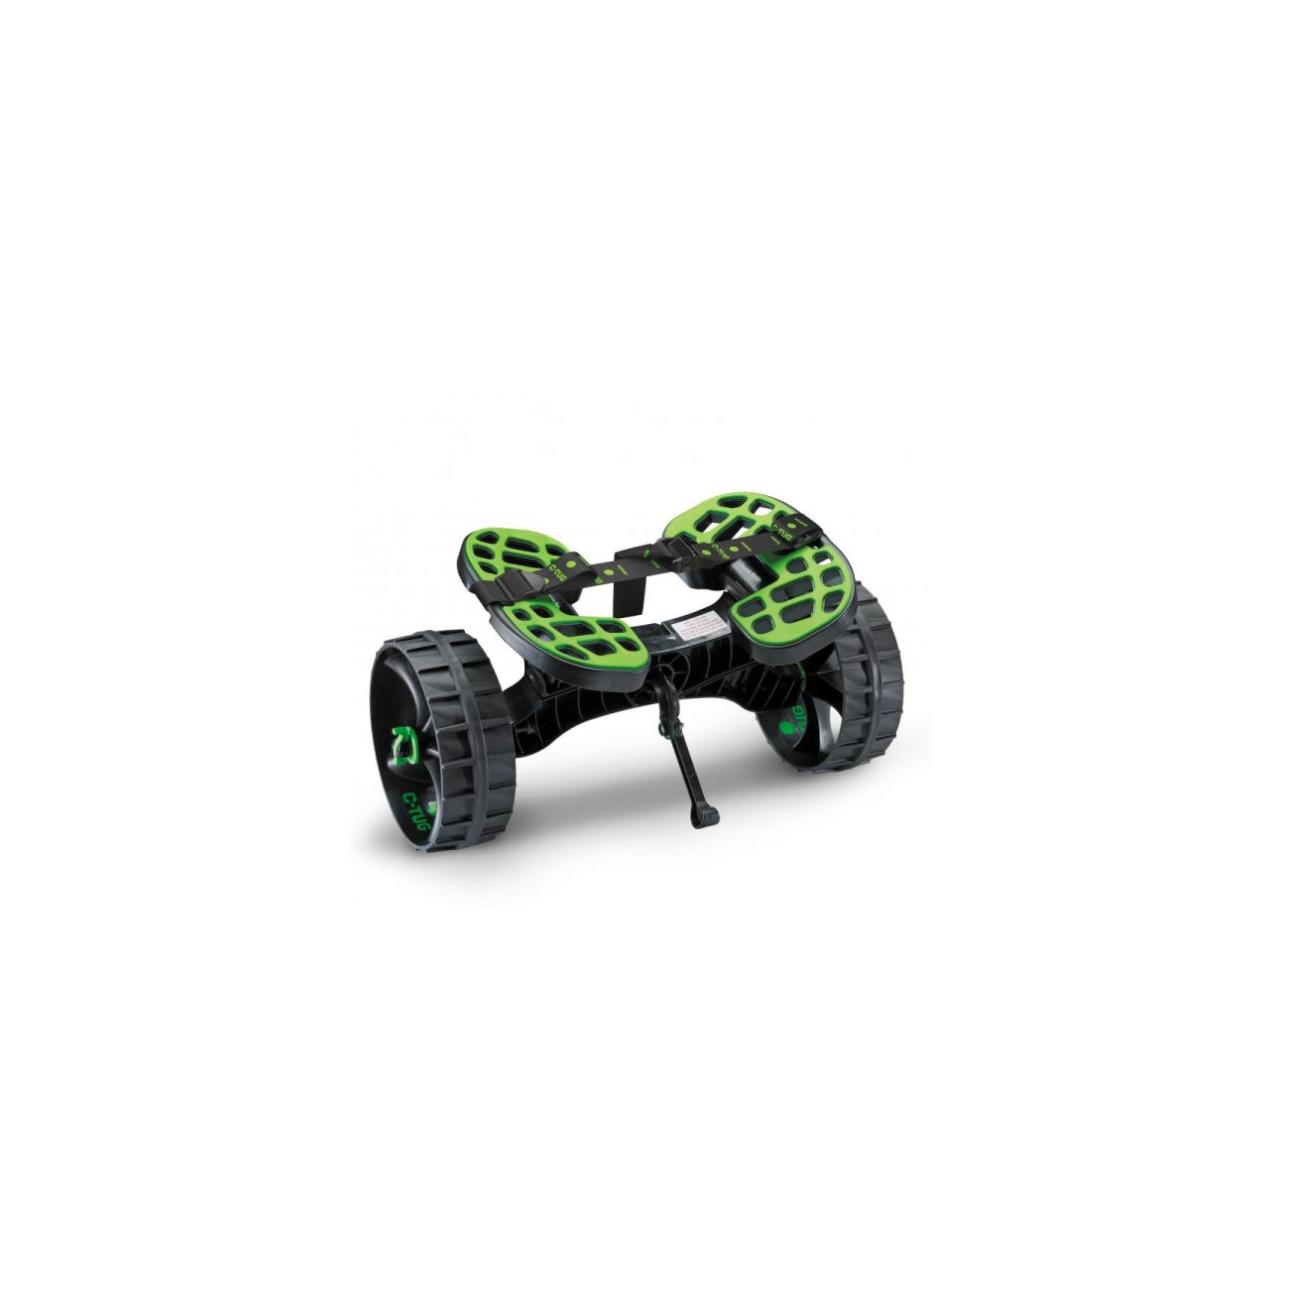 https://feelfreekayak.eu/1272-small_default/50-0001-71-c-tug-kayak-trolley-green.jpg